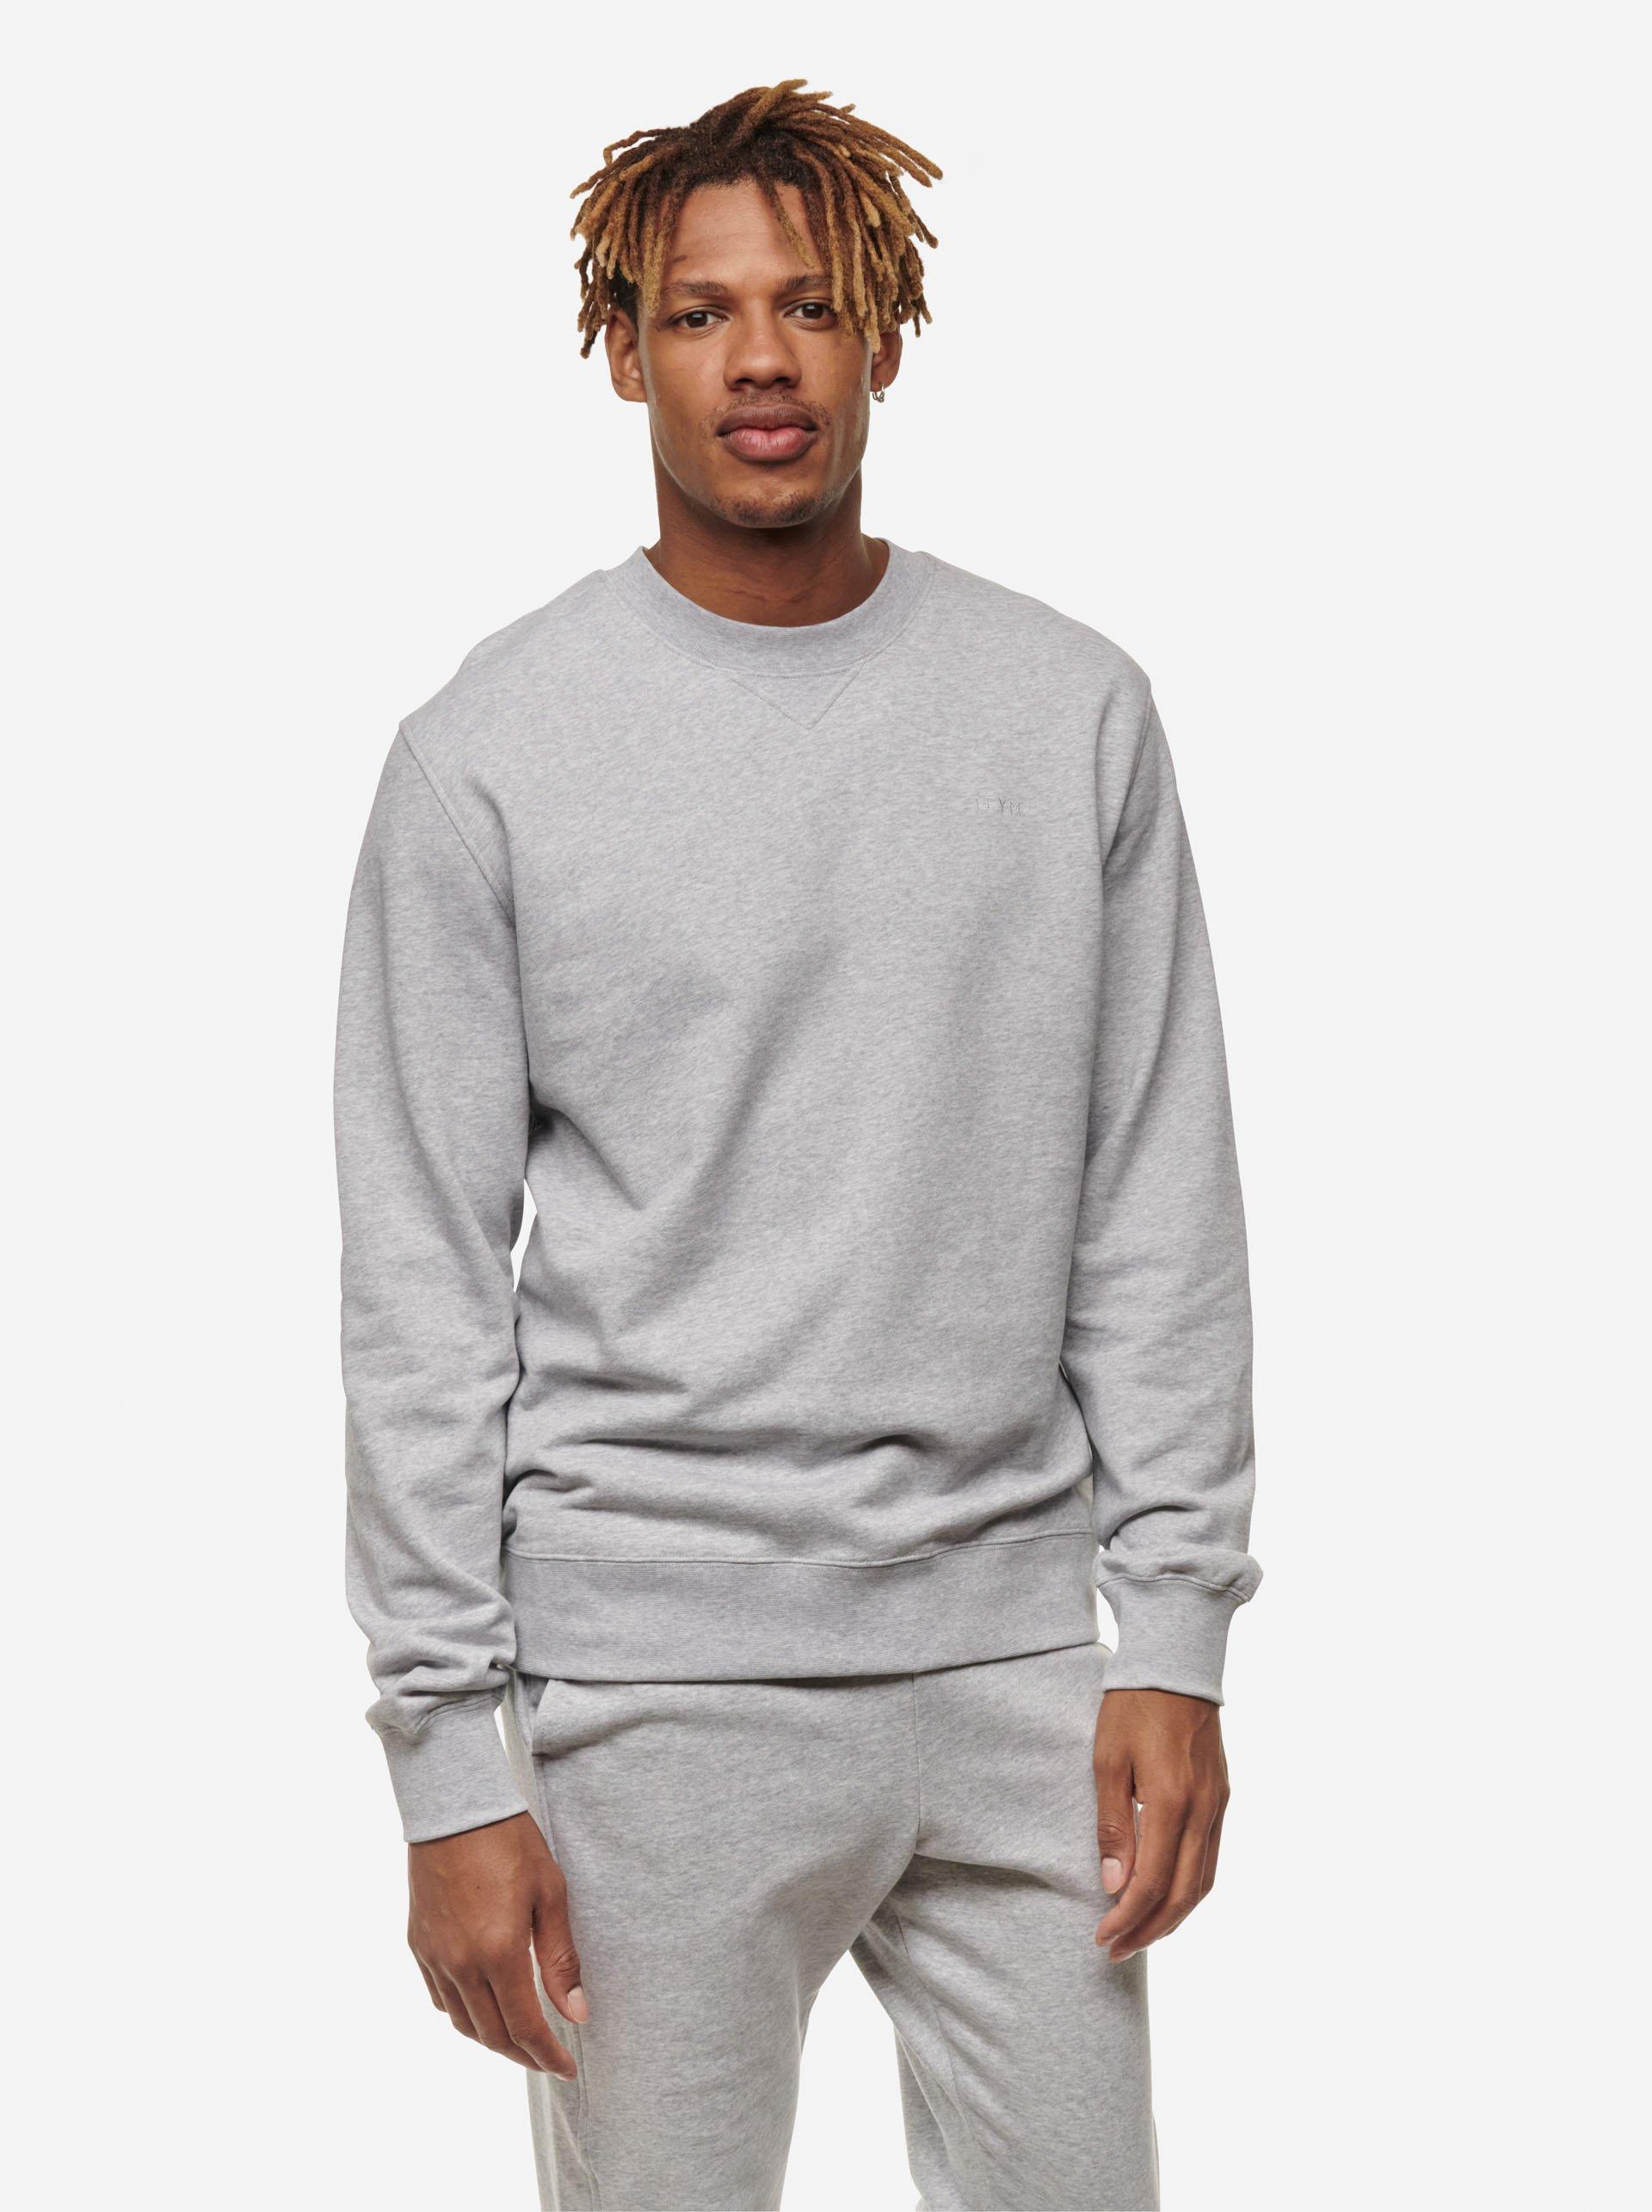 Teym-TheSweatshirt-Men-Grey01